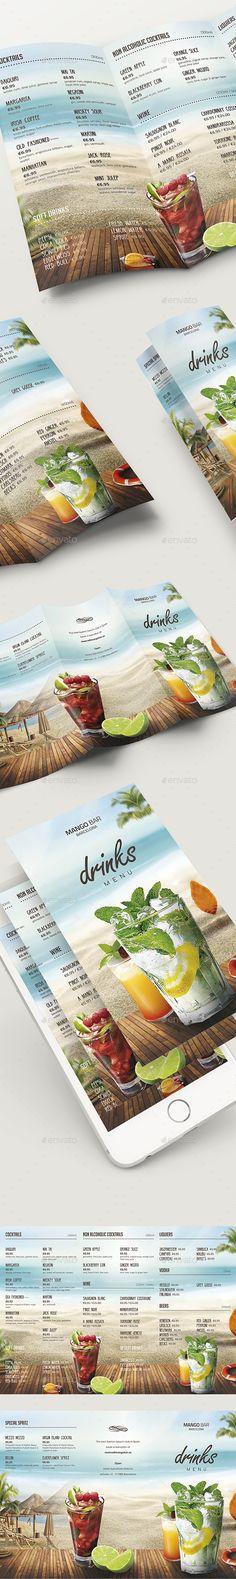 Drinks Menu Template — Photoshop PSD #template #bar menu • Available here → https://graphicriver.net/item/drinks-menu-template/17137904?ref=pxcr